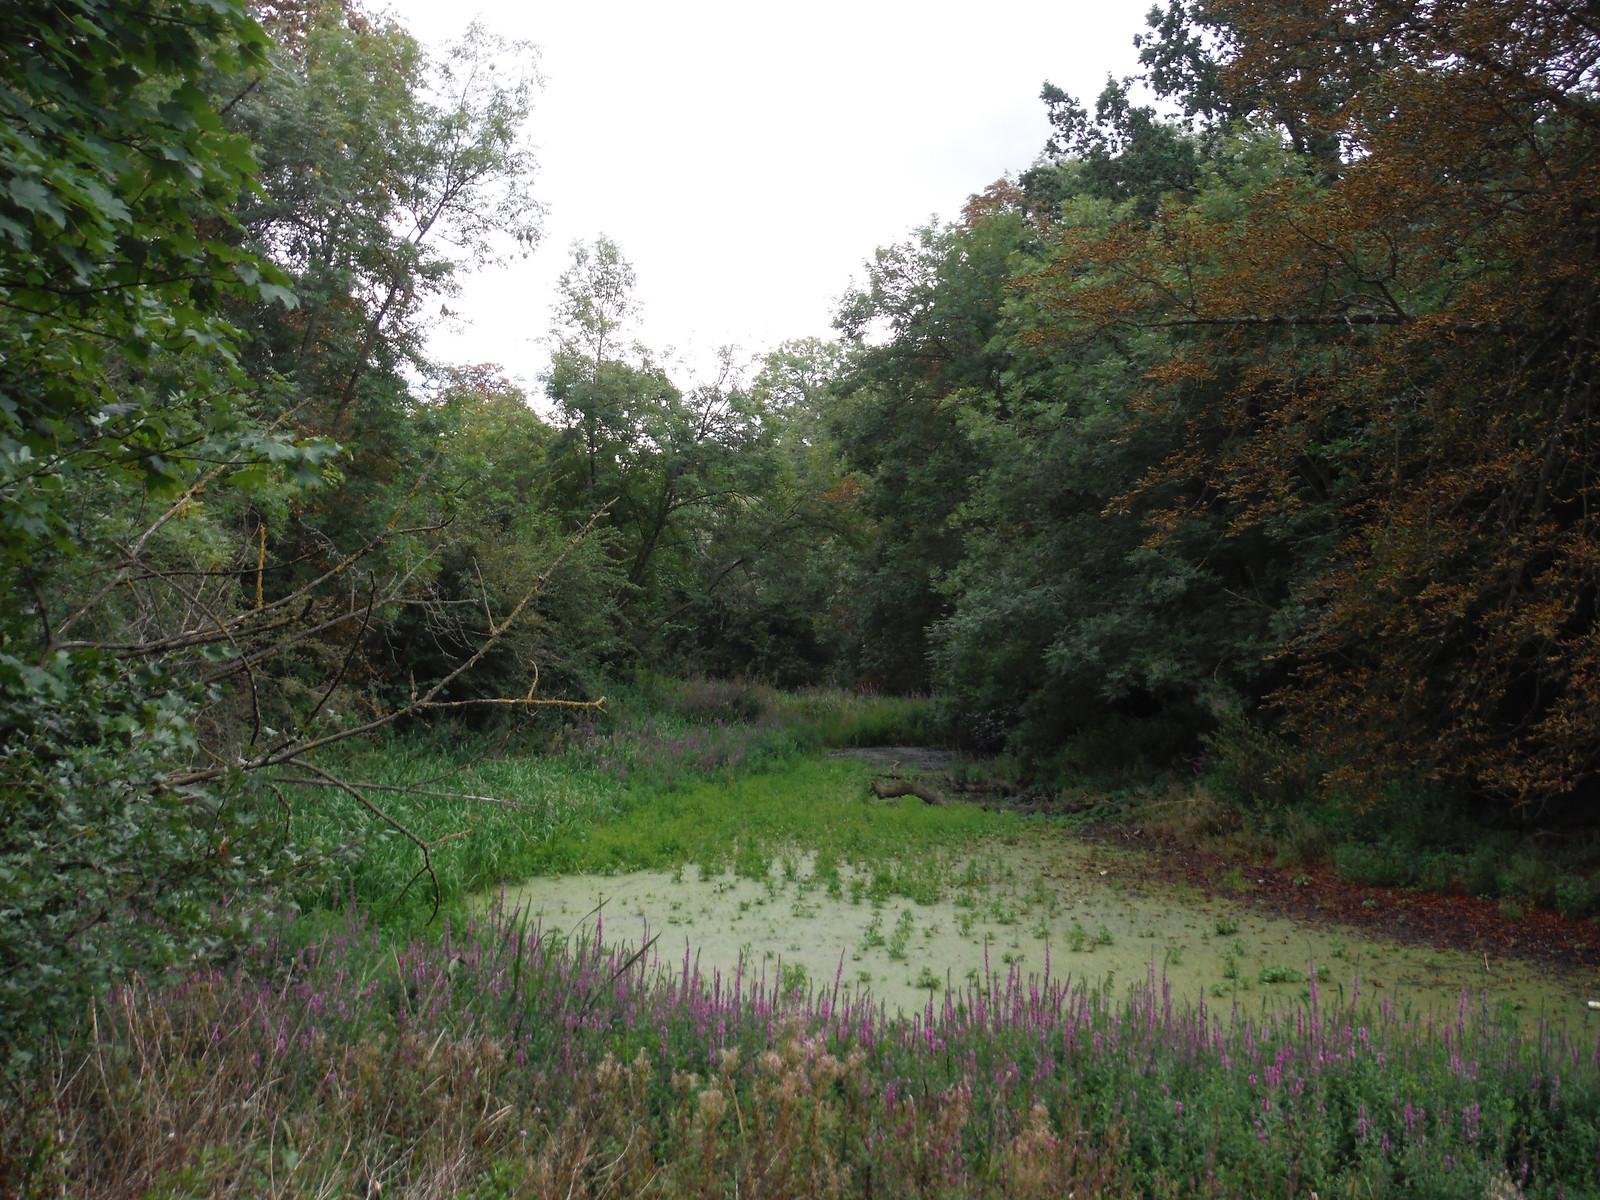 Part of Ornamental Pond fallen dry SWC Walk Short 11 - Wanstead Park